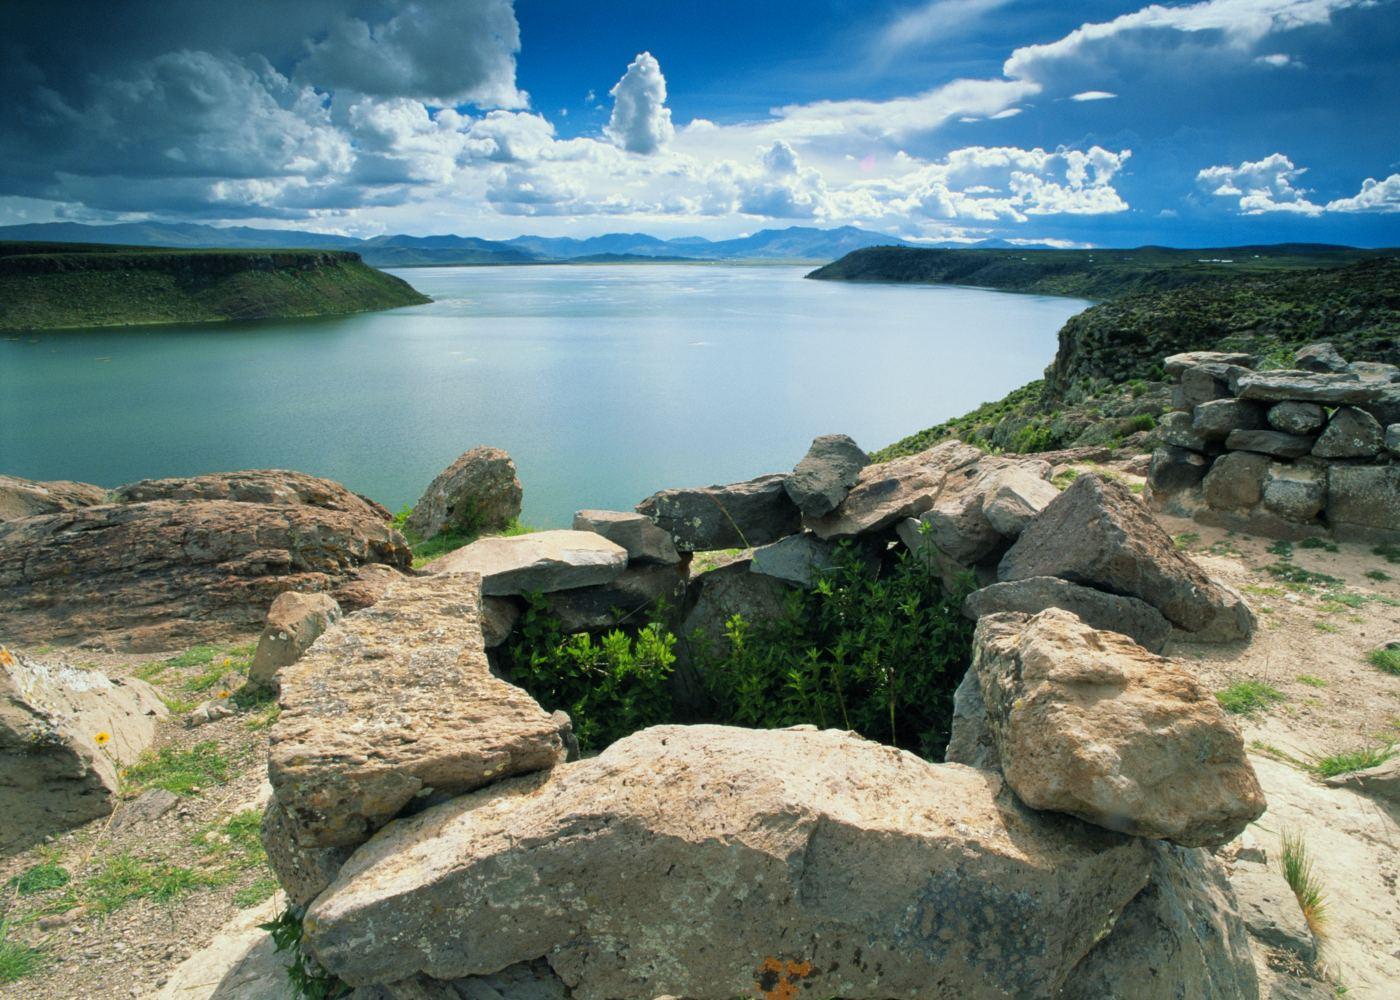 Panorâmica do lago Titicaca